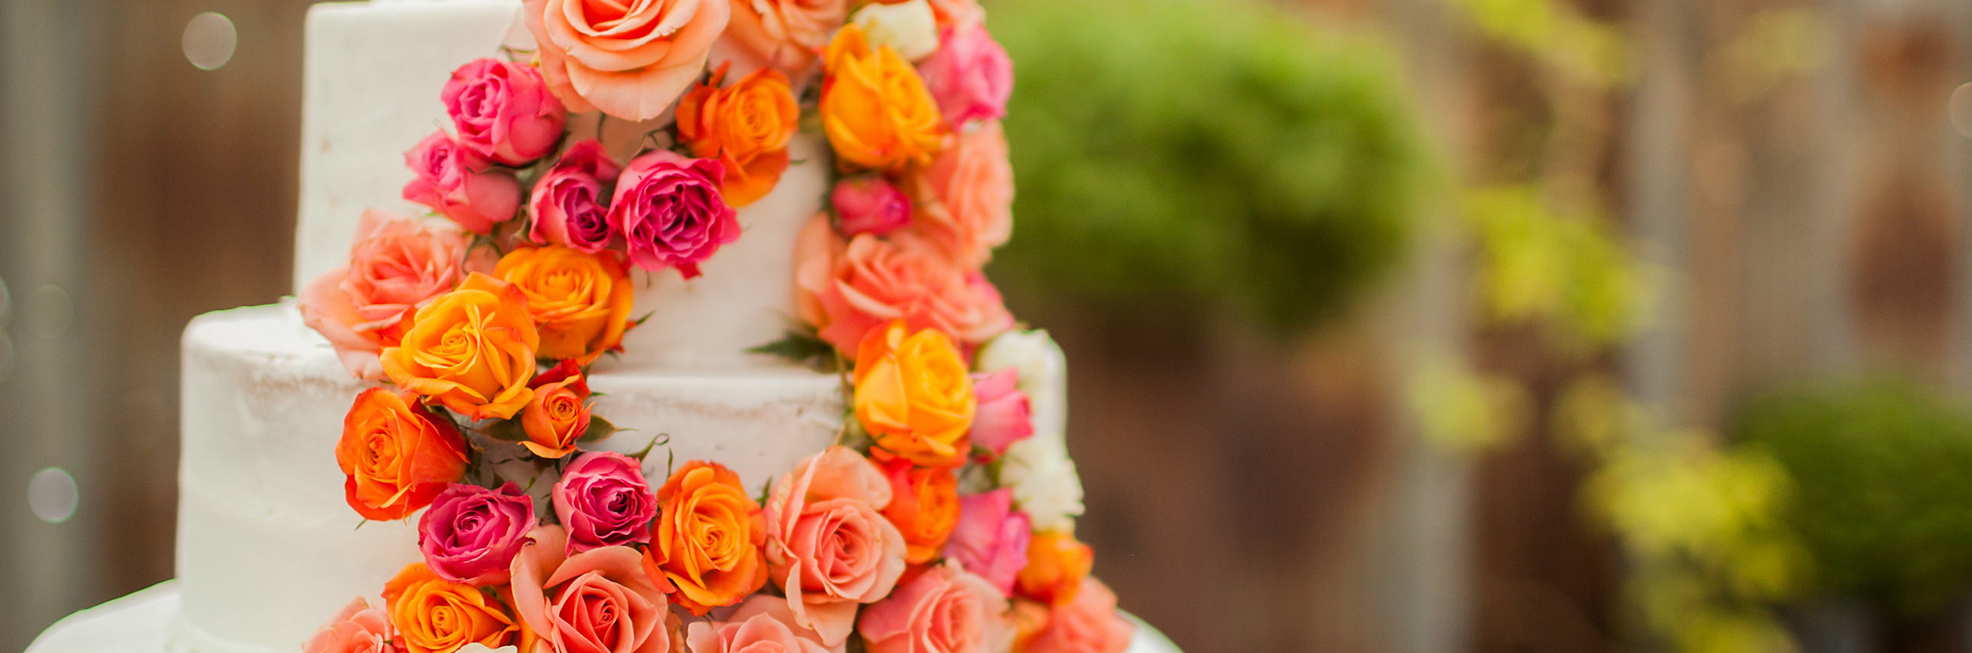 Wedding Cake Trends 2022